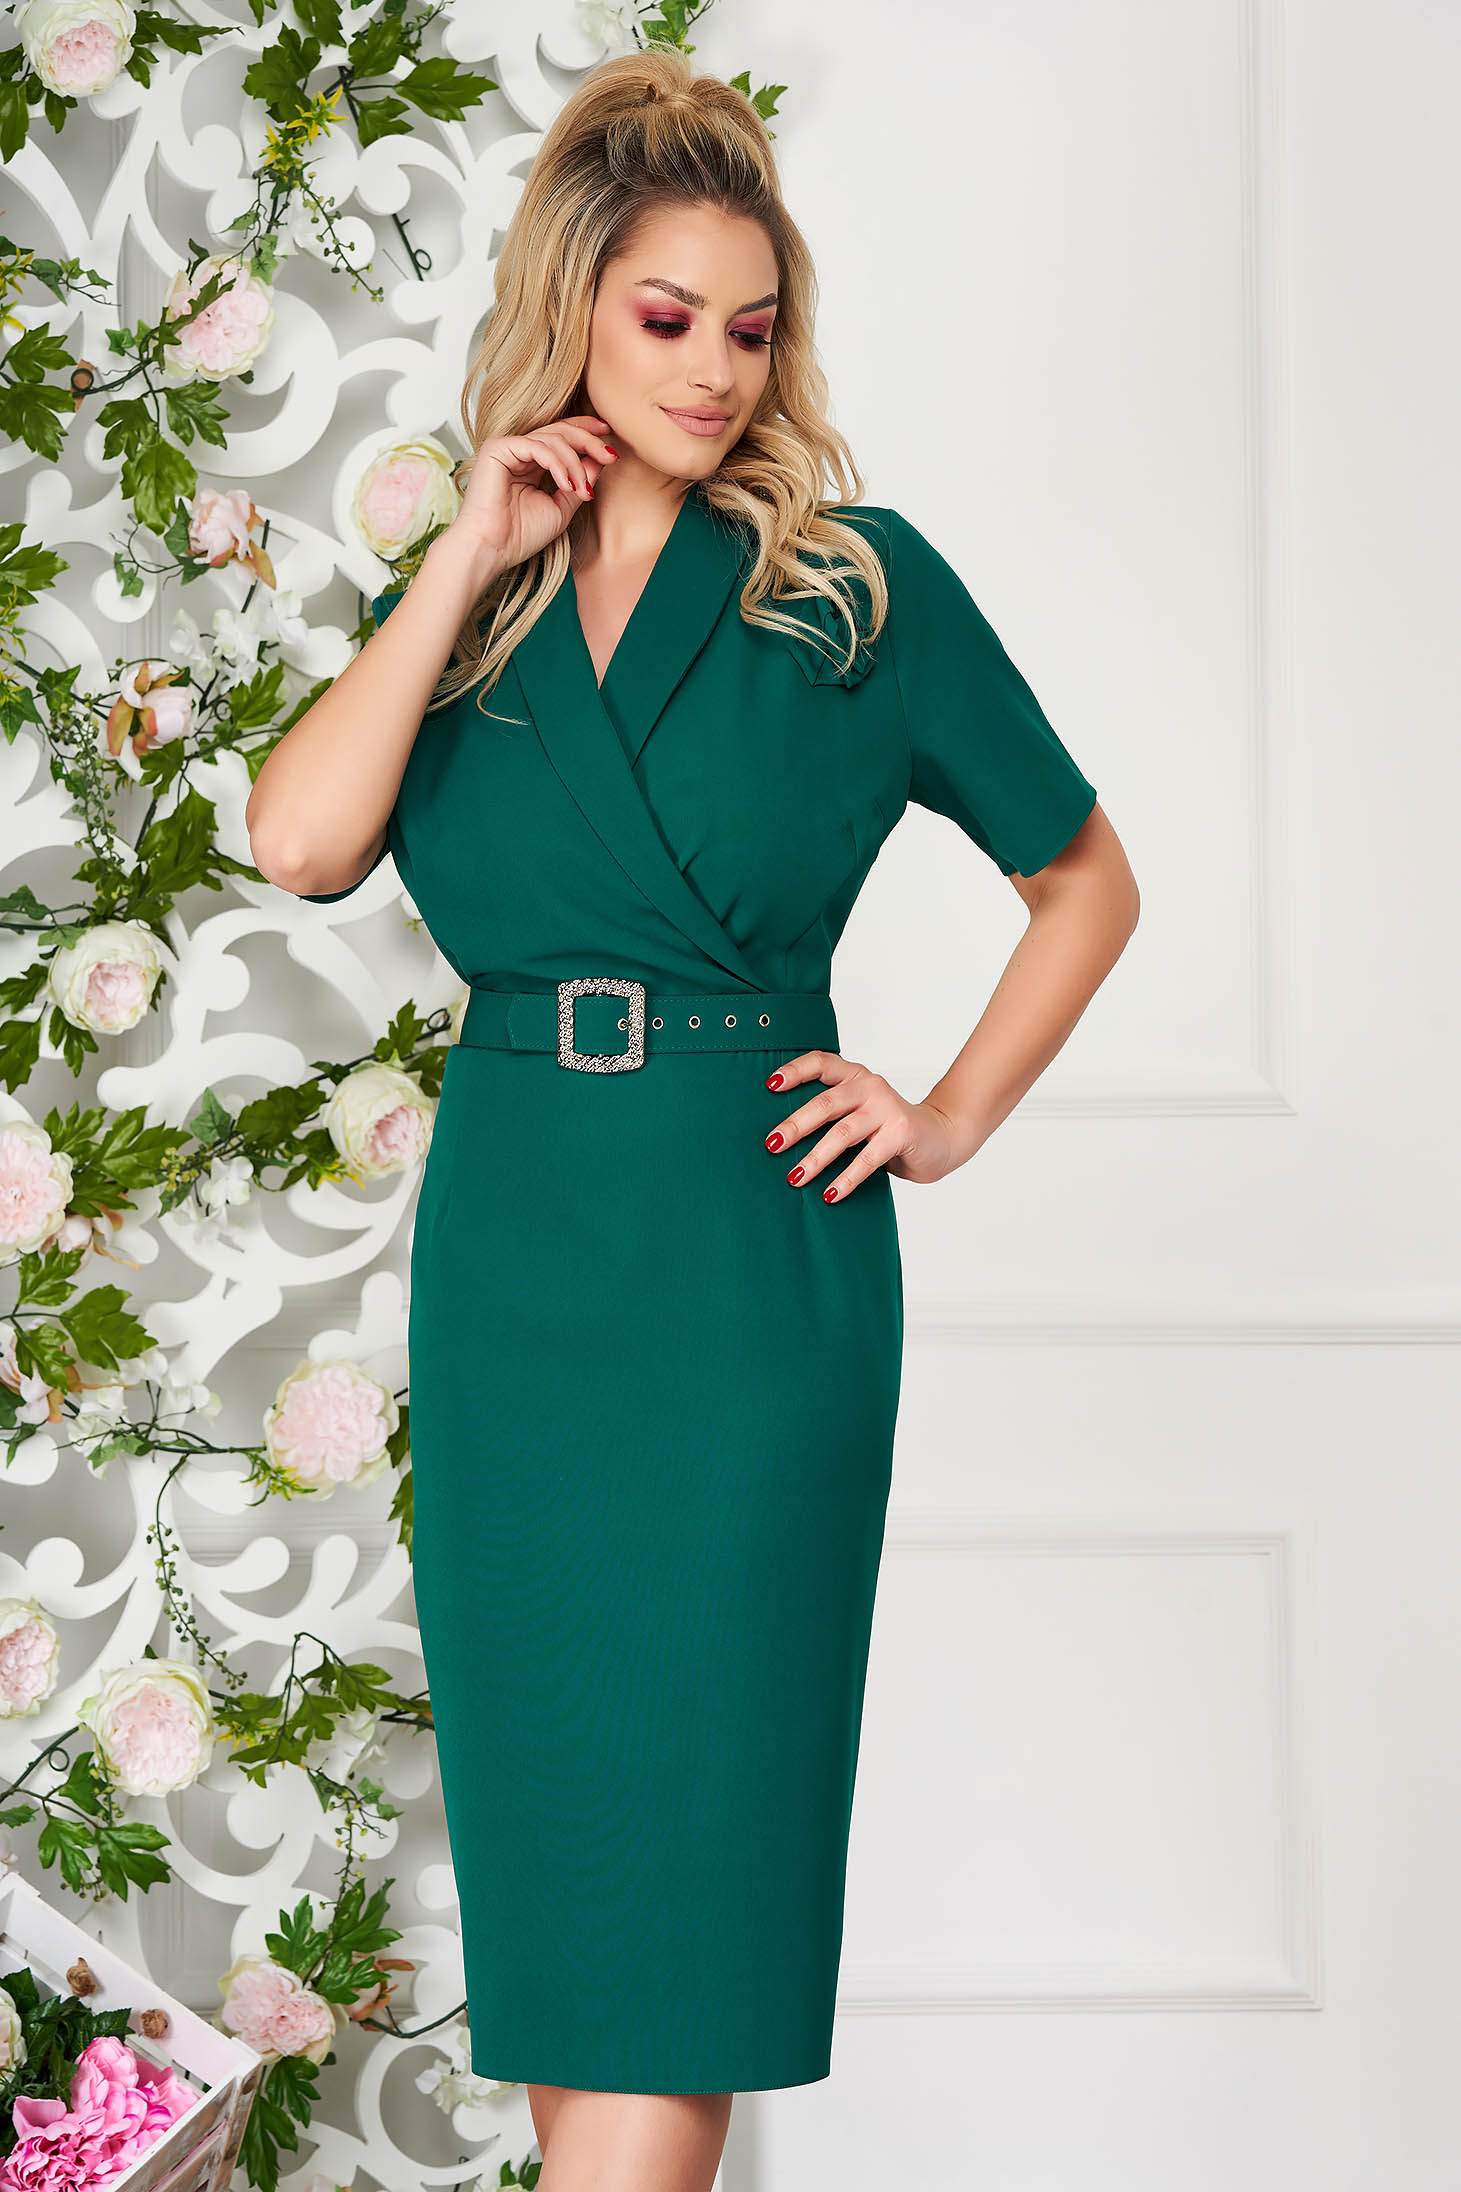 Rochie verde eleganta midi tip creion din stofa subtire accesorizata cu brosa